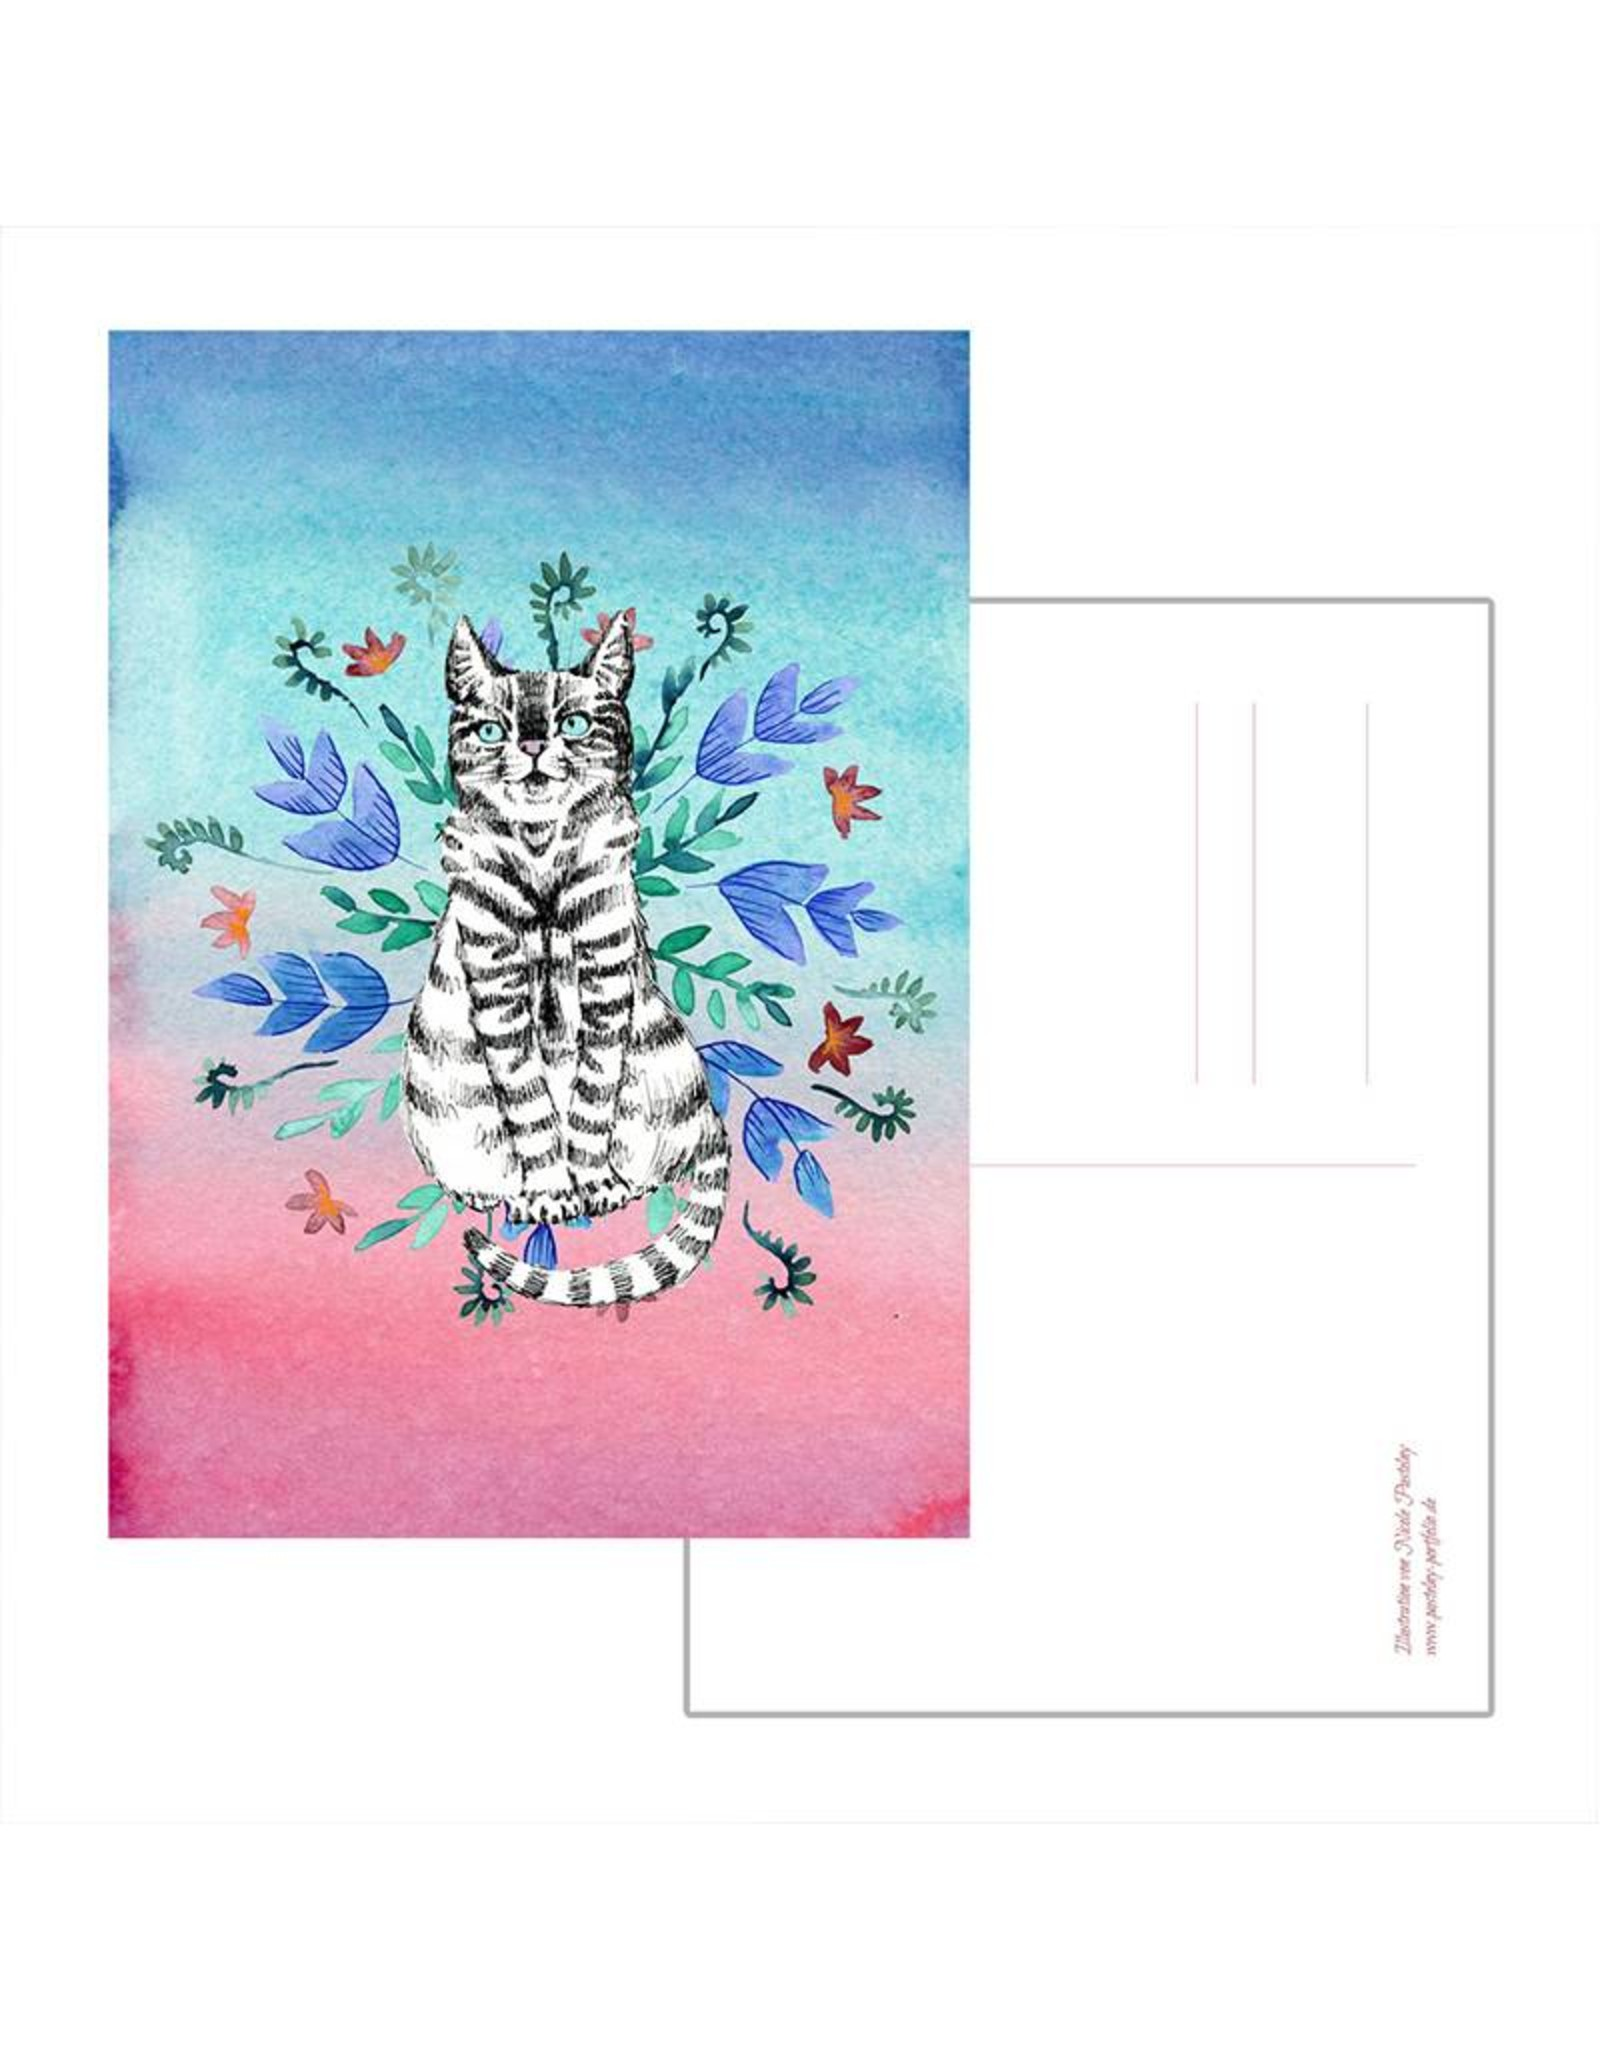 Nicole Pustelny Postkarte - Katze